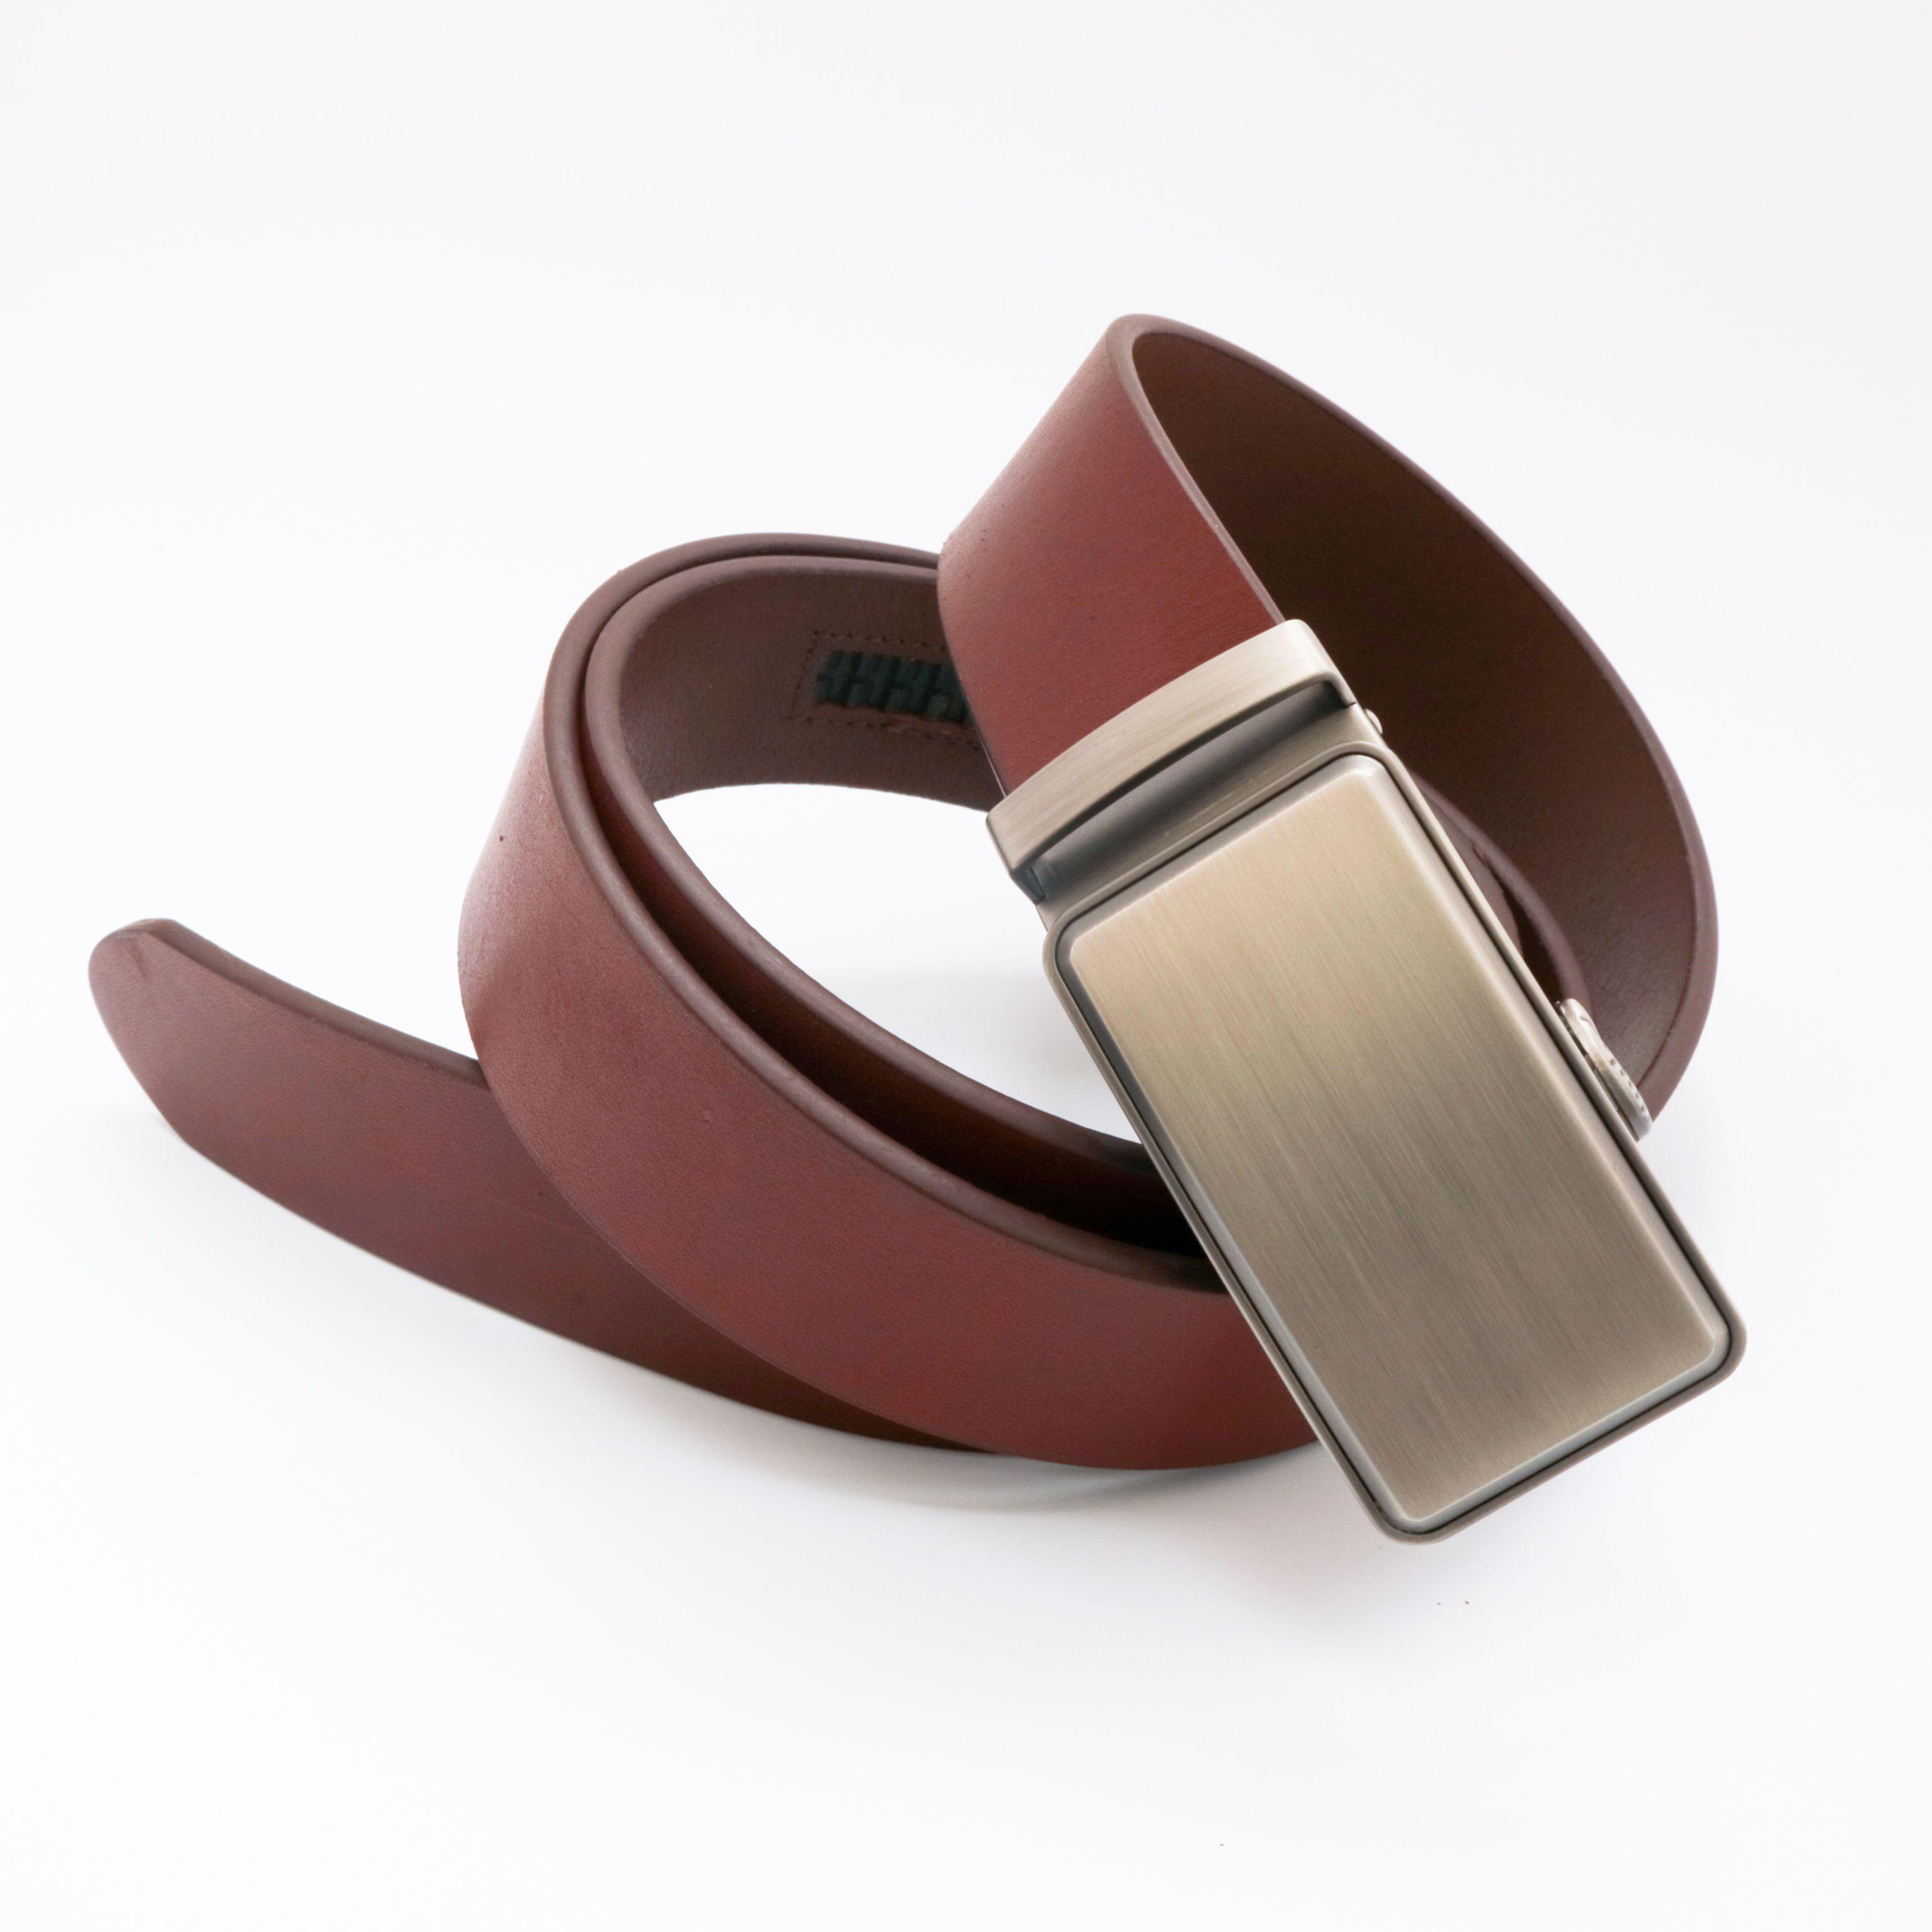 IMG 6613 Thắt lưng nam FTT leather